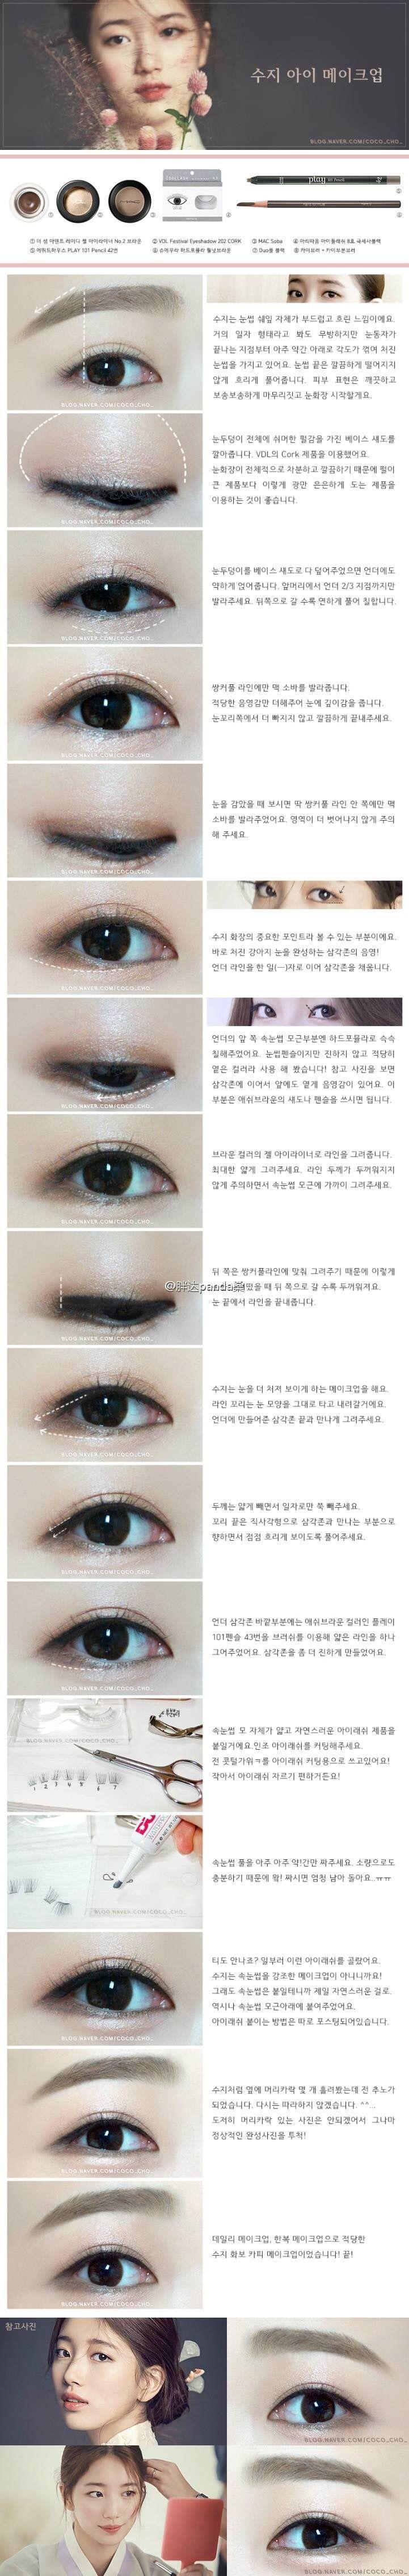 MISS A SUZY 《FIRST LOOK PICTORIAL》Korean kpop idol makeup tutorial (cr:coc...